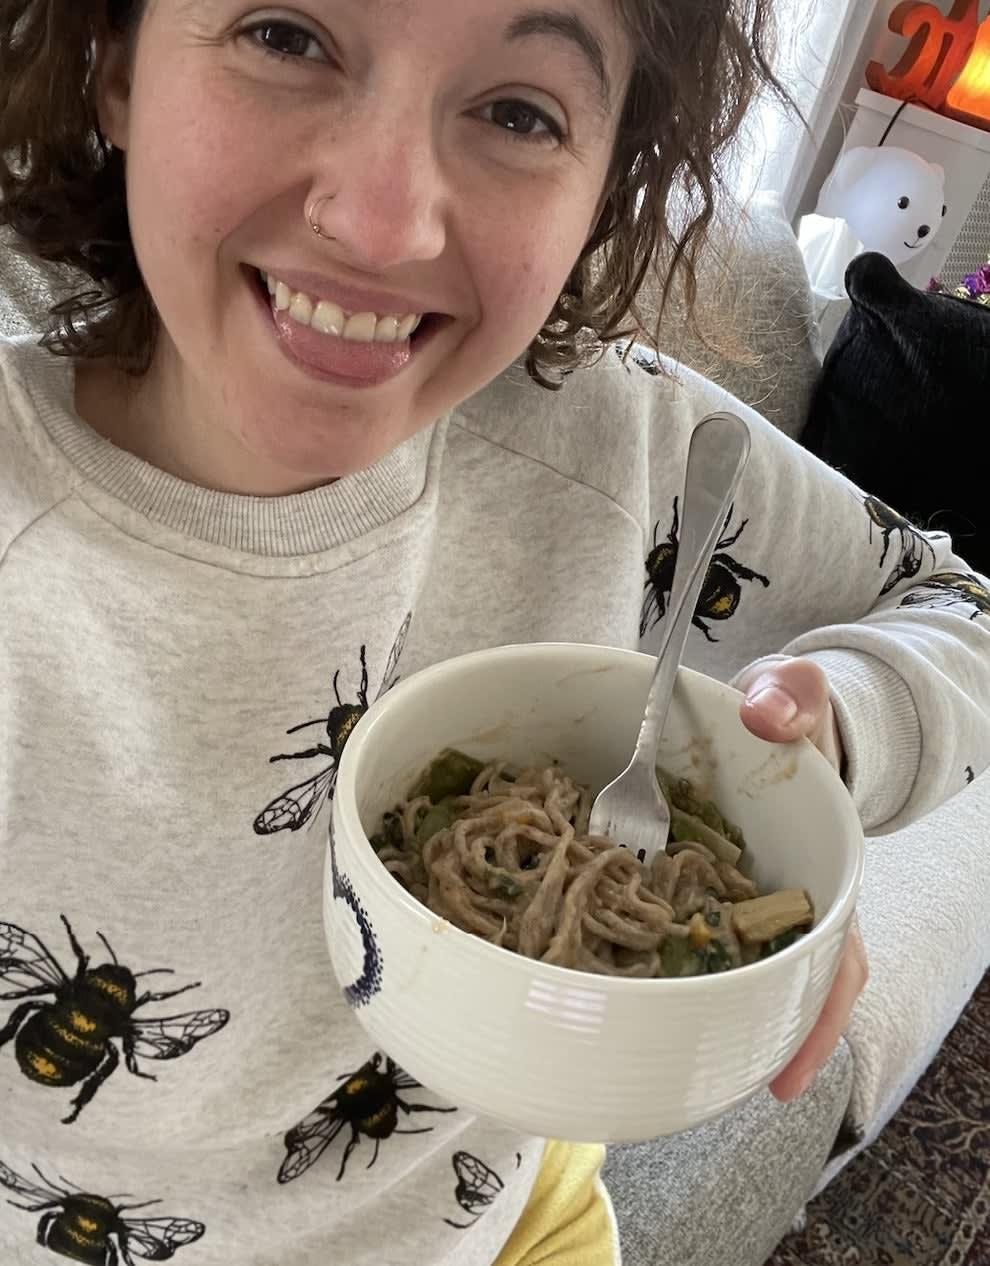 A person holding ginger sesame noodles